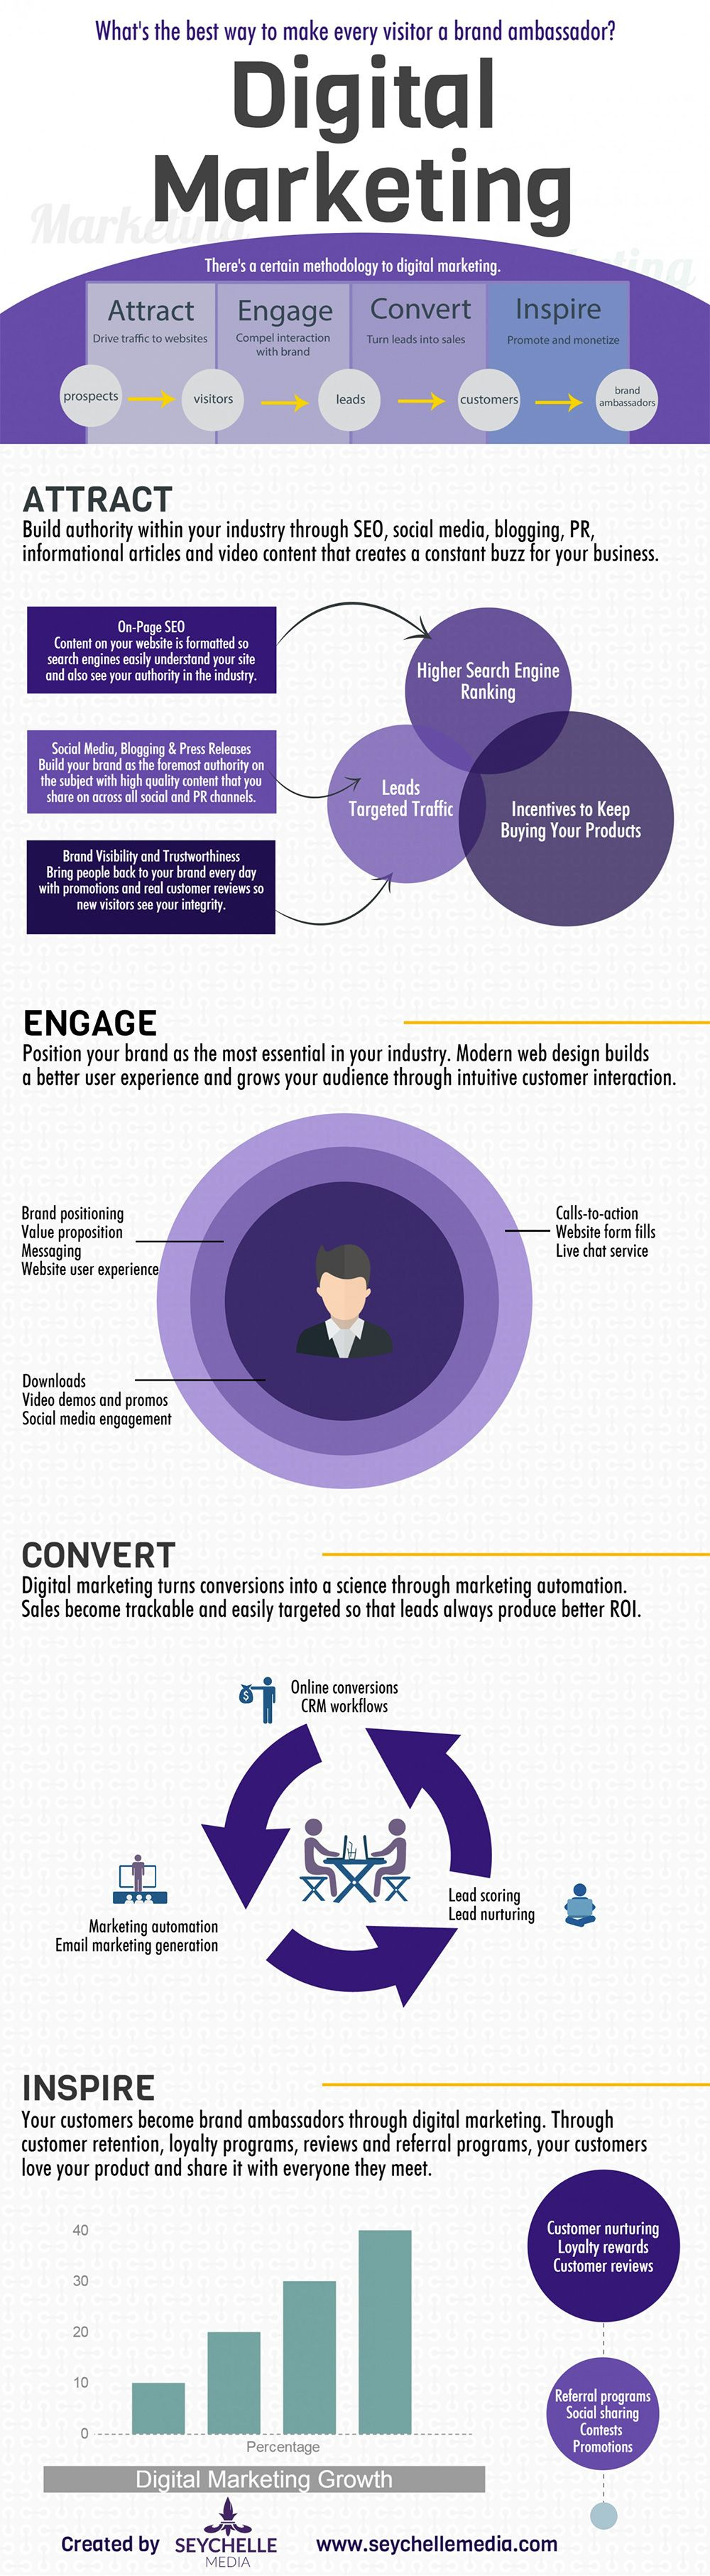 4 Basic Steps to Turn Web Visitors Into Brand Ambassadors (Infographic)